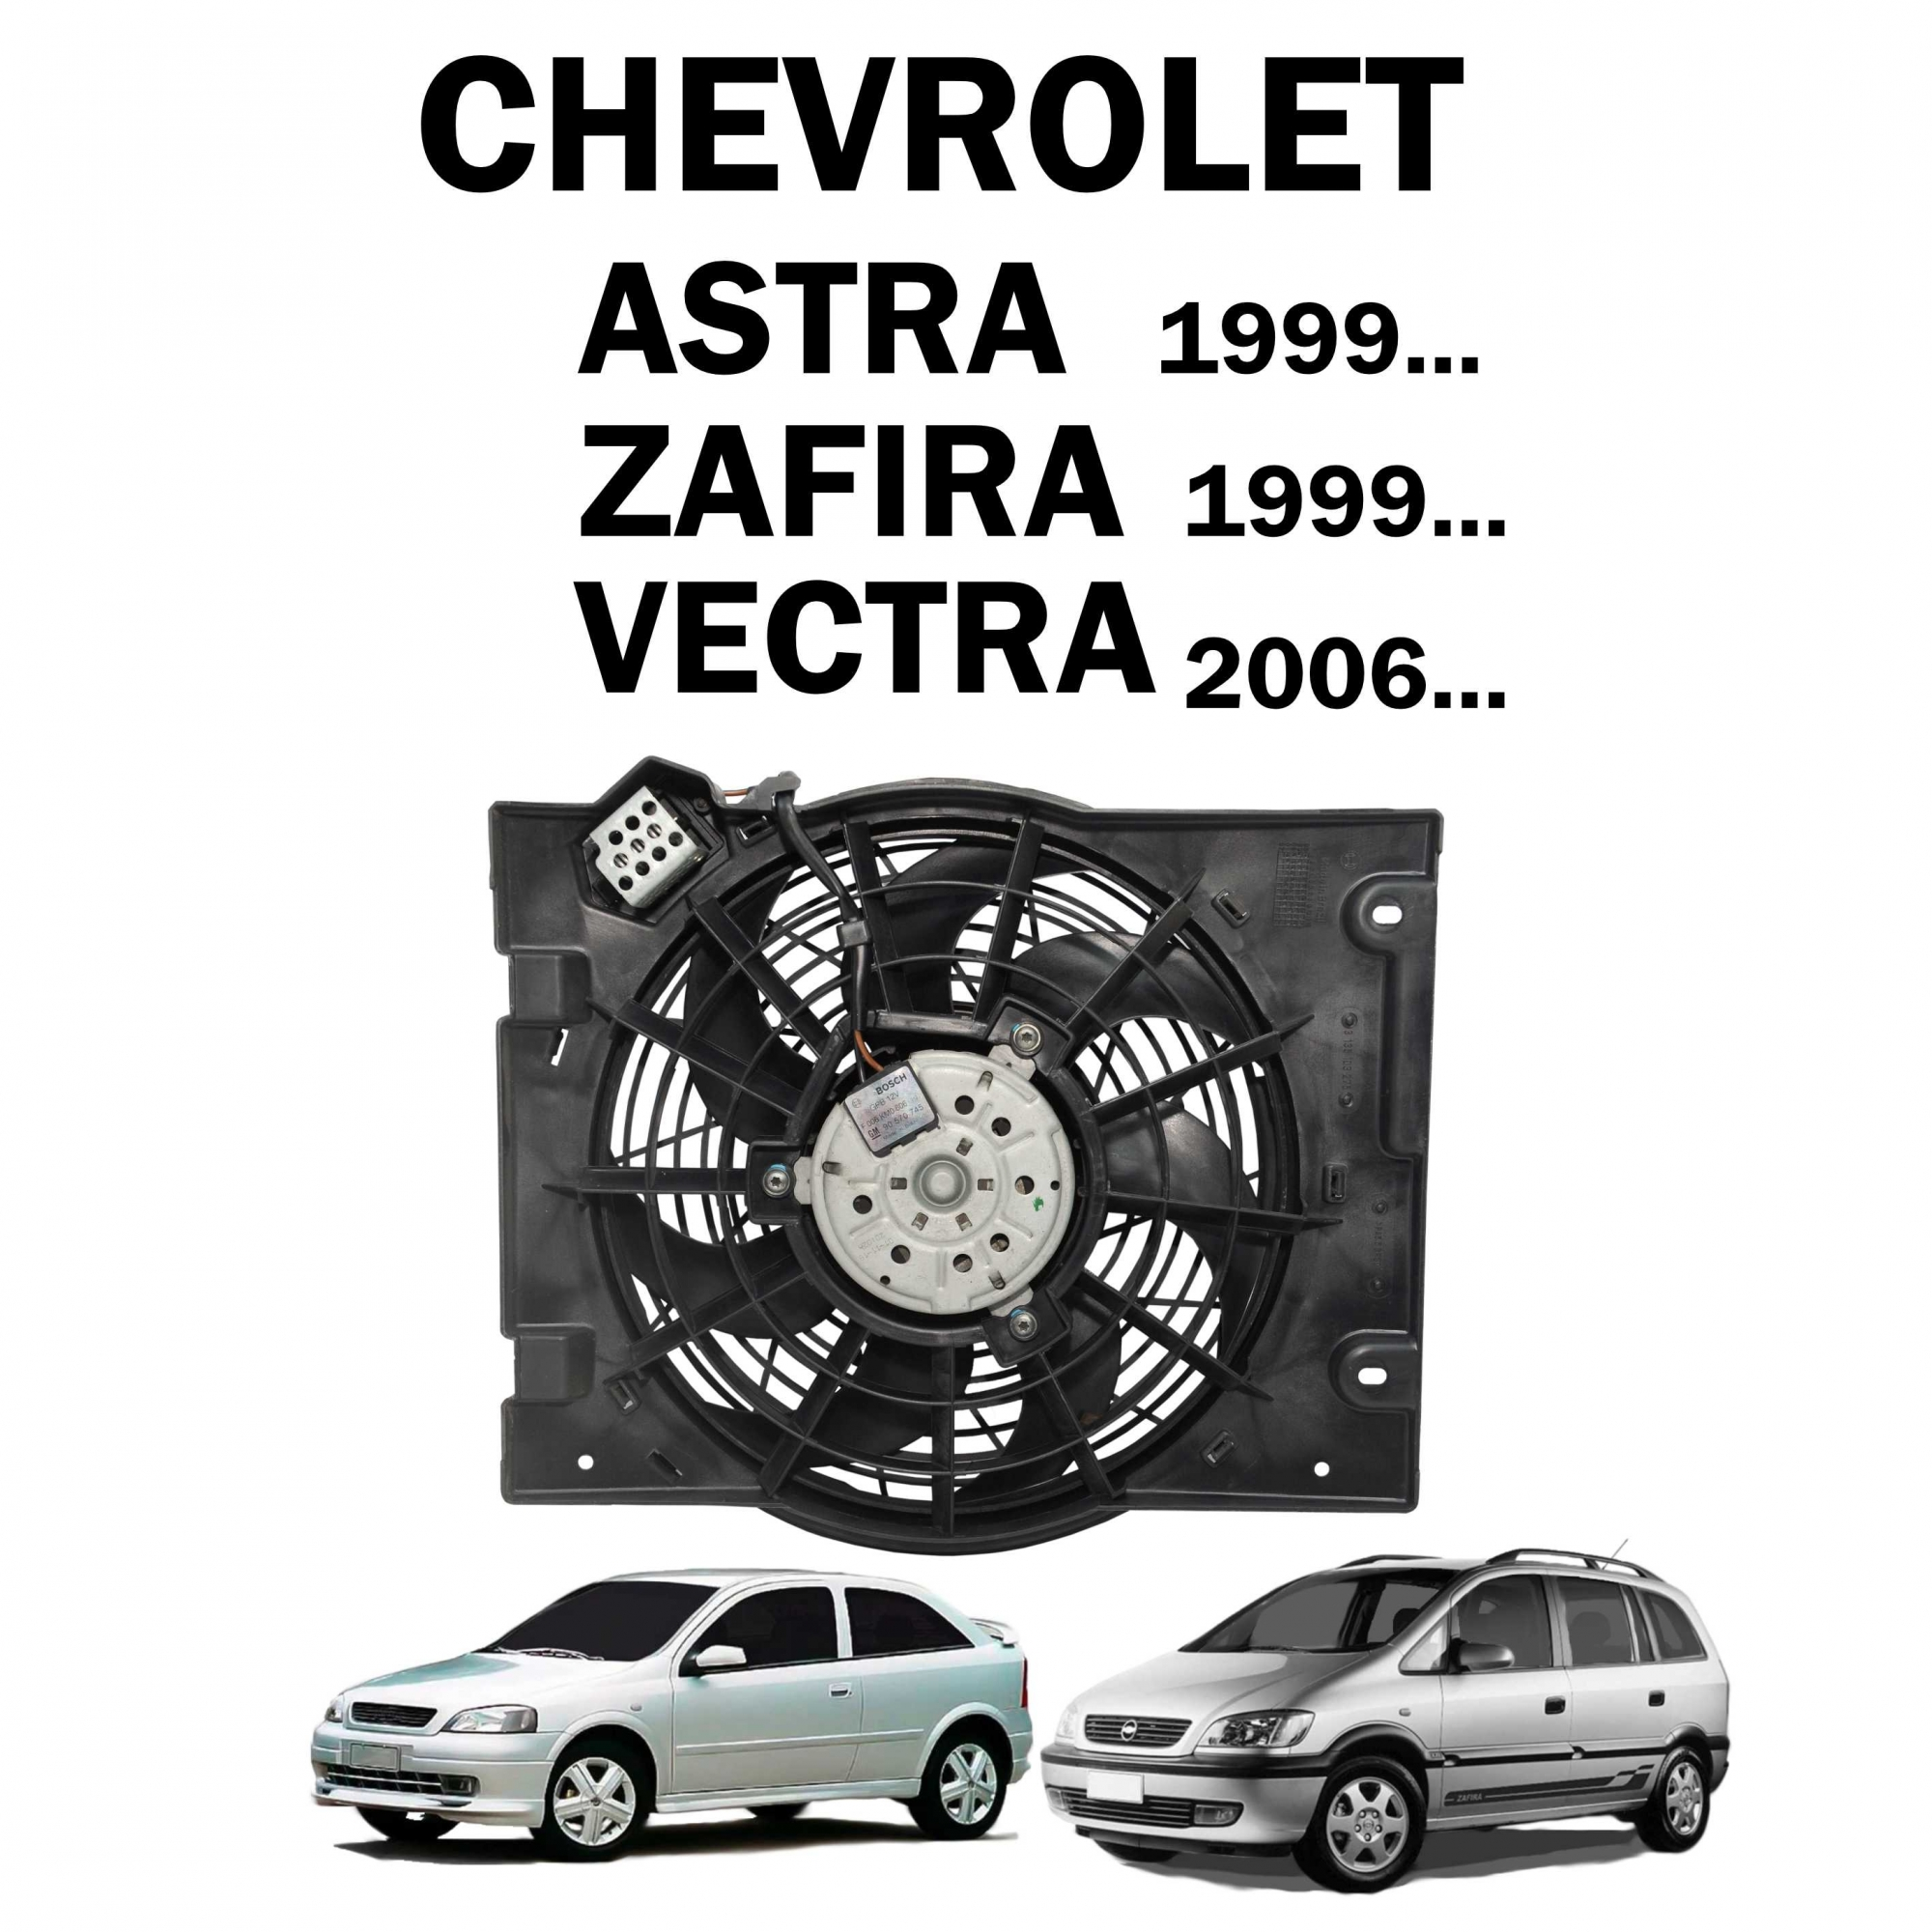 Eletroventilador Ventoinha Astra 99..., Zafira 99..., Vectra 2006... c/ AC Lado Condensador